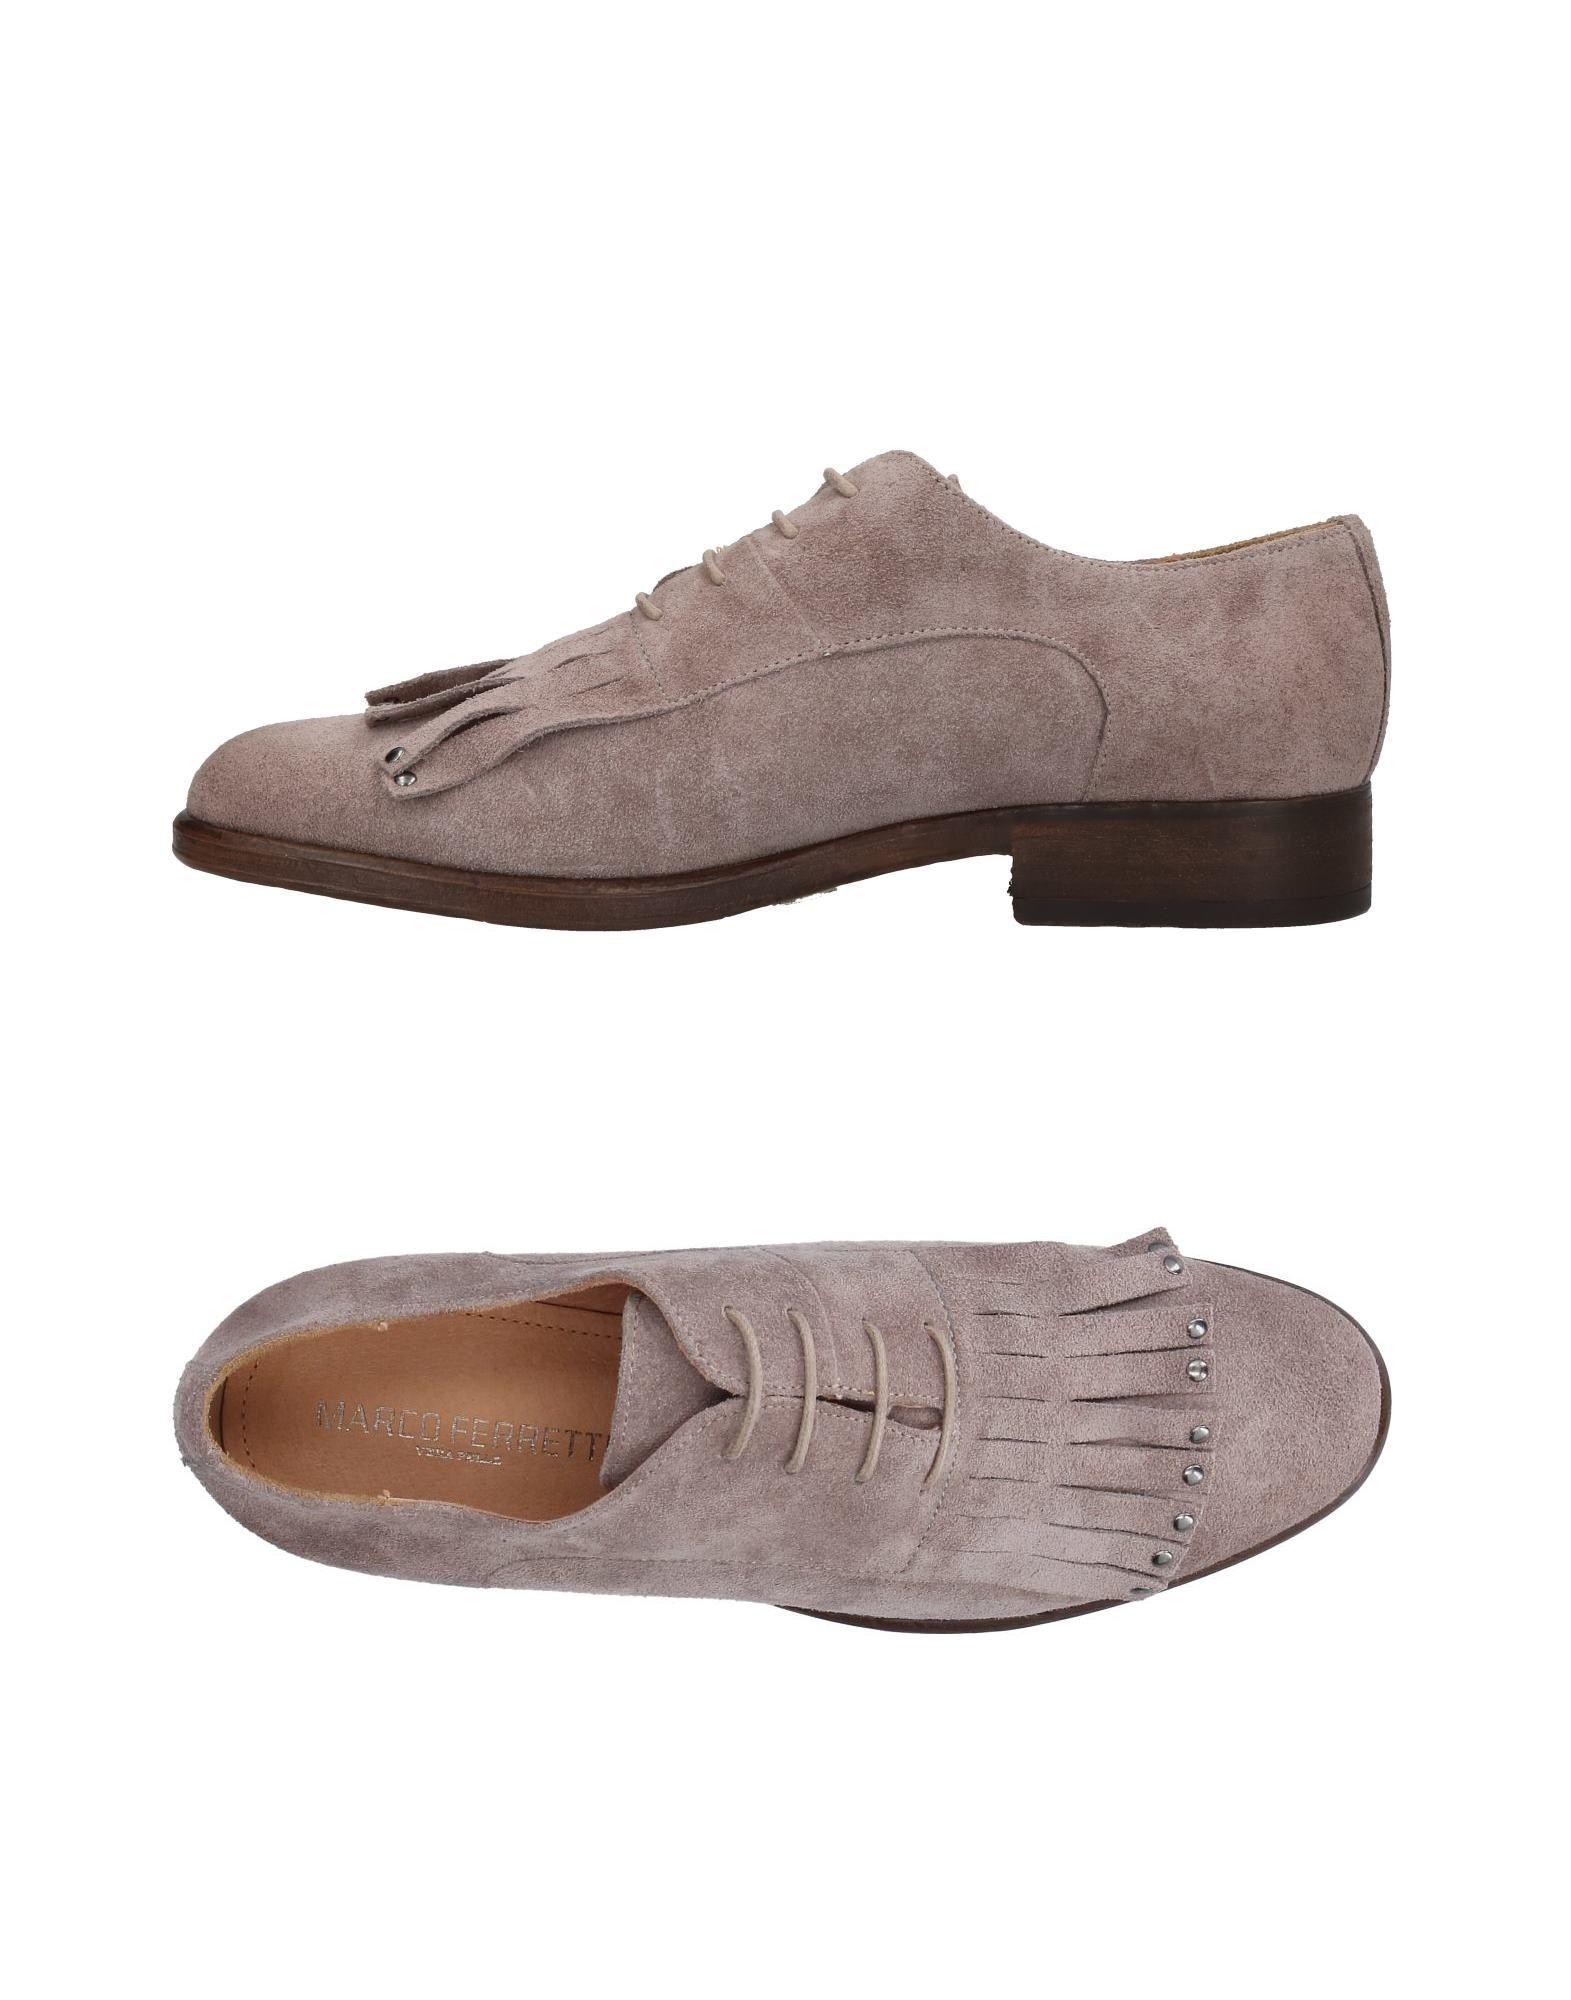 Chaussures À Lacets Marco Ferretti Femme - Chaussures À Lacets Marco Ferretti sur